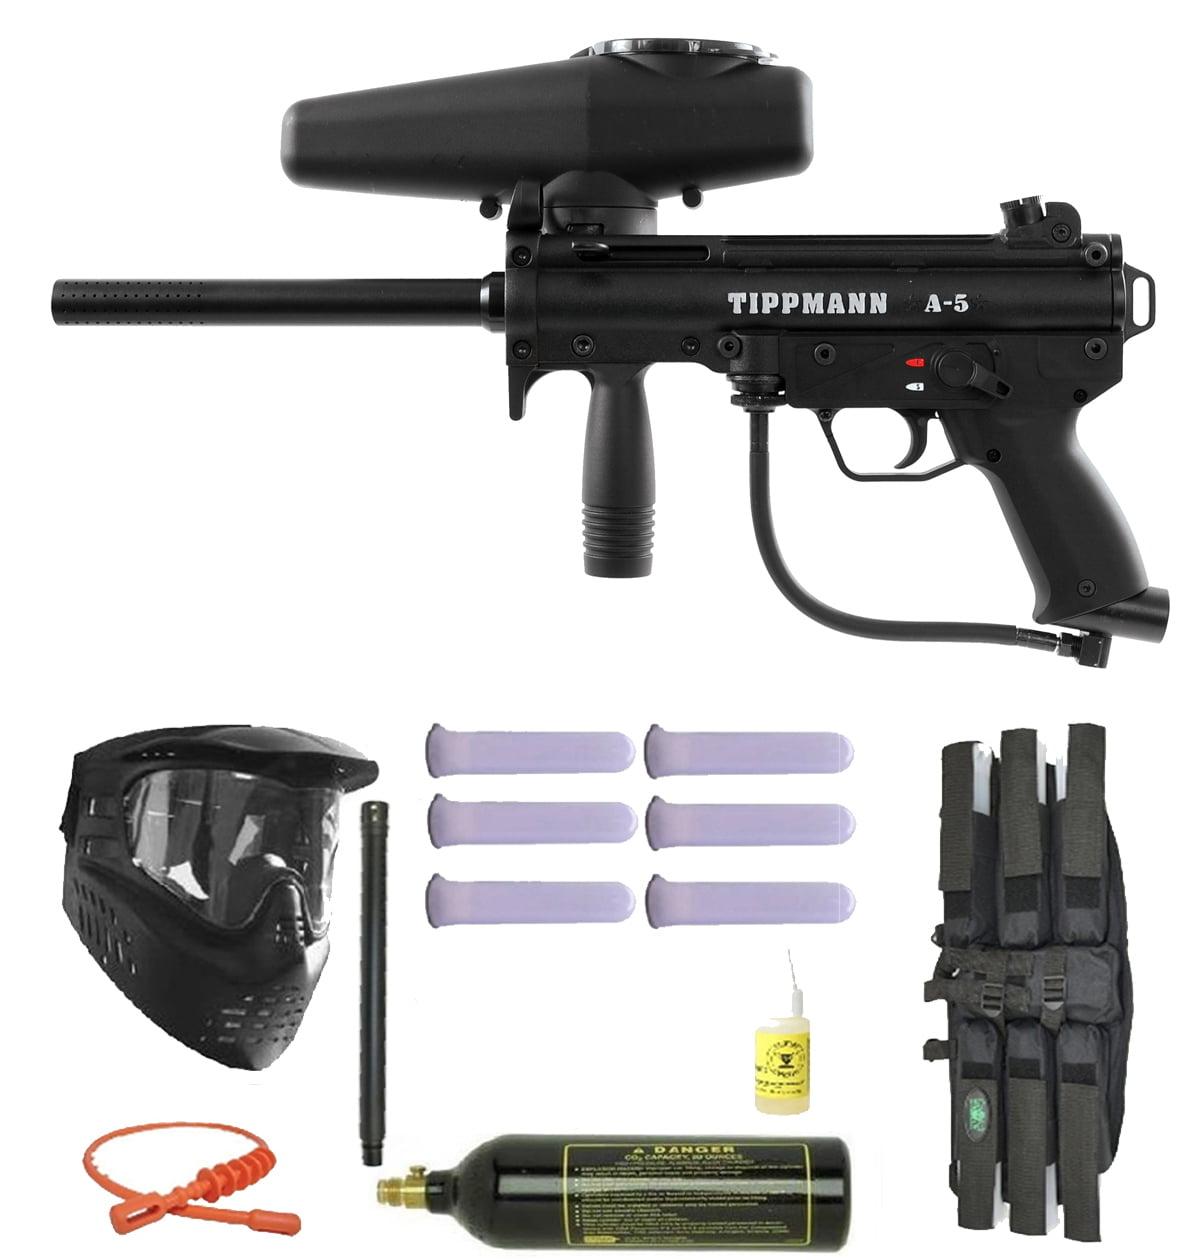 Click here to buy Tippmann A-5 Paintball Marker Gun 3Skull Super Mega Set by Tippmann Paintball.